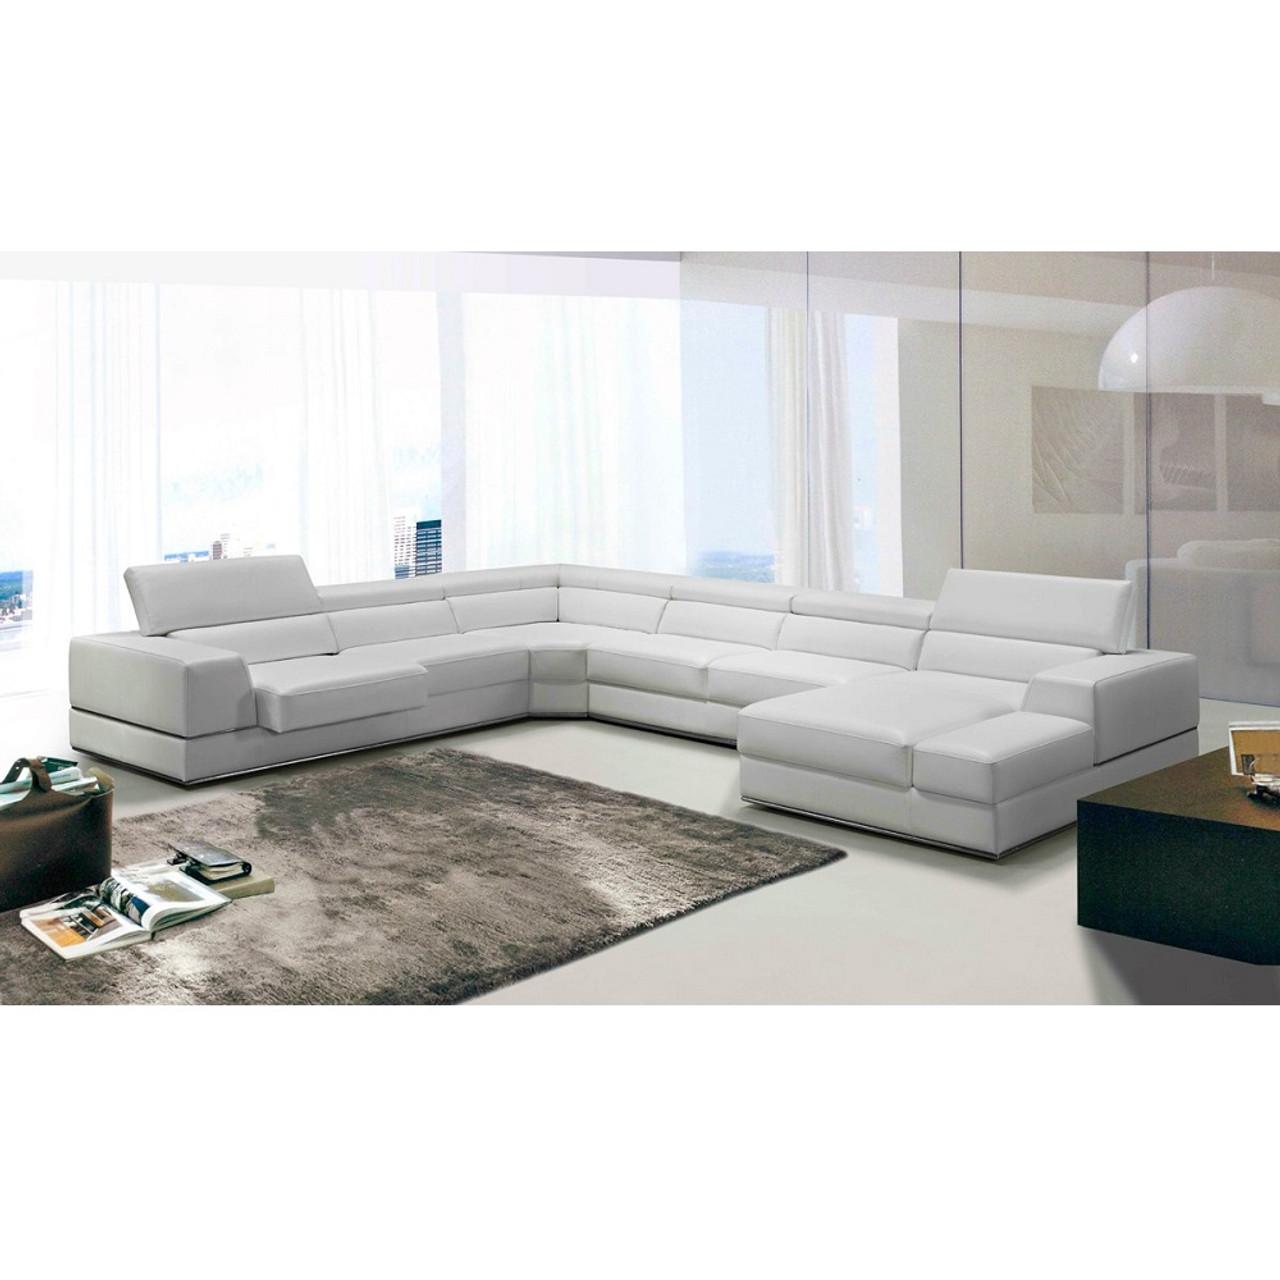 Divani Casa Pella Modern White Italian Leather Sectional Sofa ...